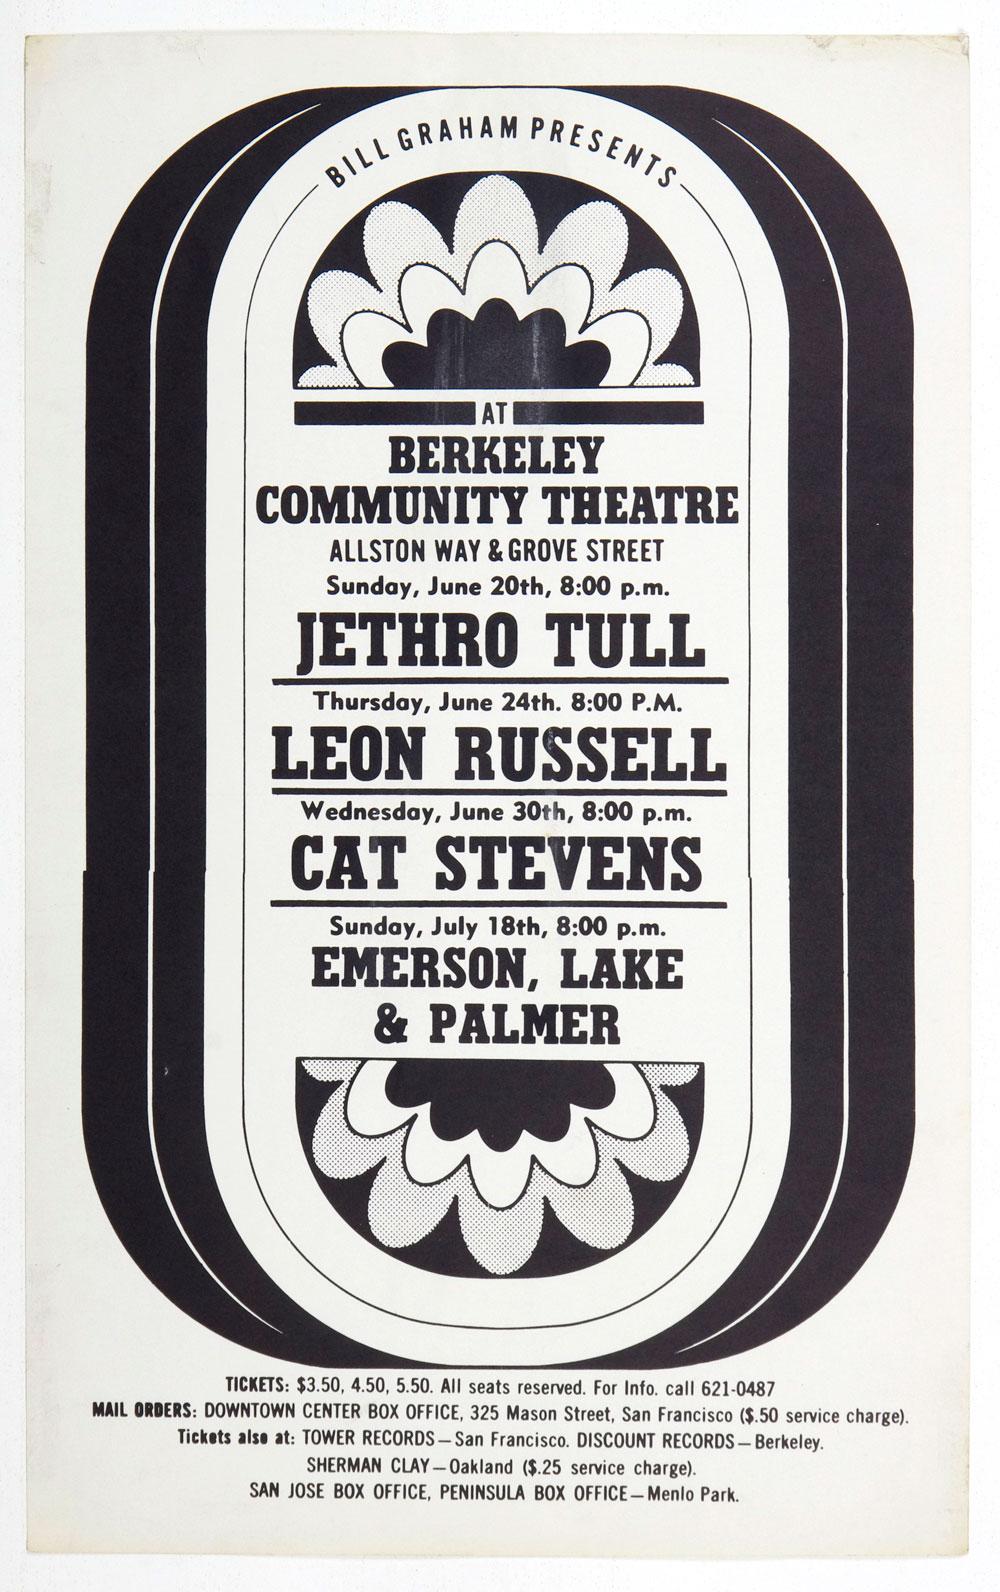 BIll Graham Presents Poster 1971 Jethro Tull Cat Stevense Berkeley Community Theatre